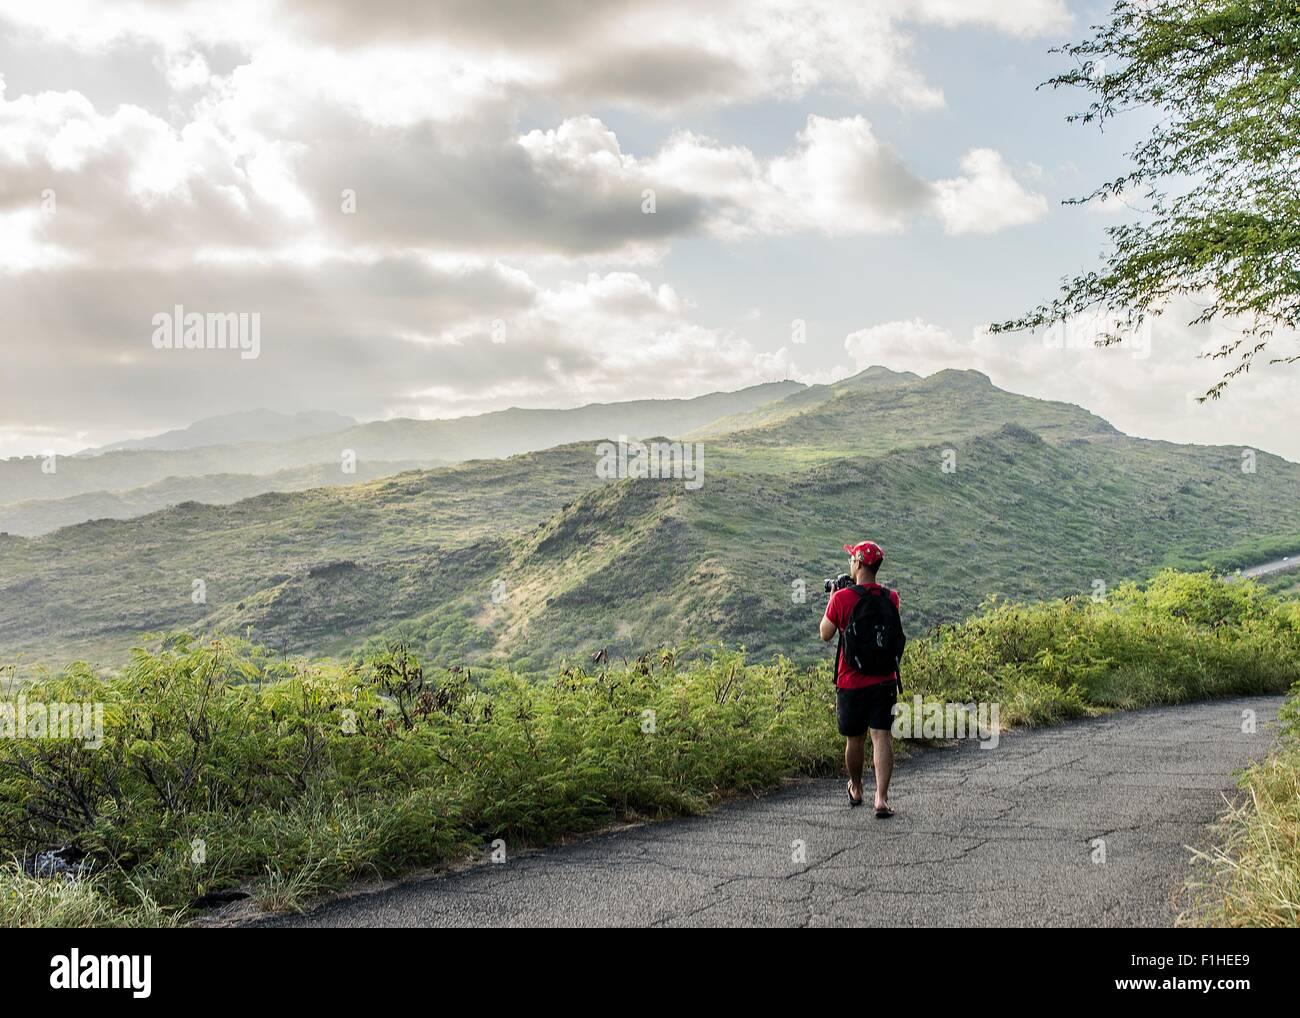 Young male tourist photographing with digital SLR on Makapuu coast path, Oahu, Hawaii, USA - Stock Image